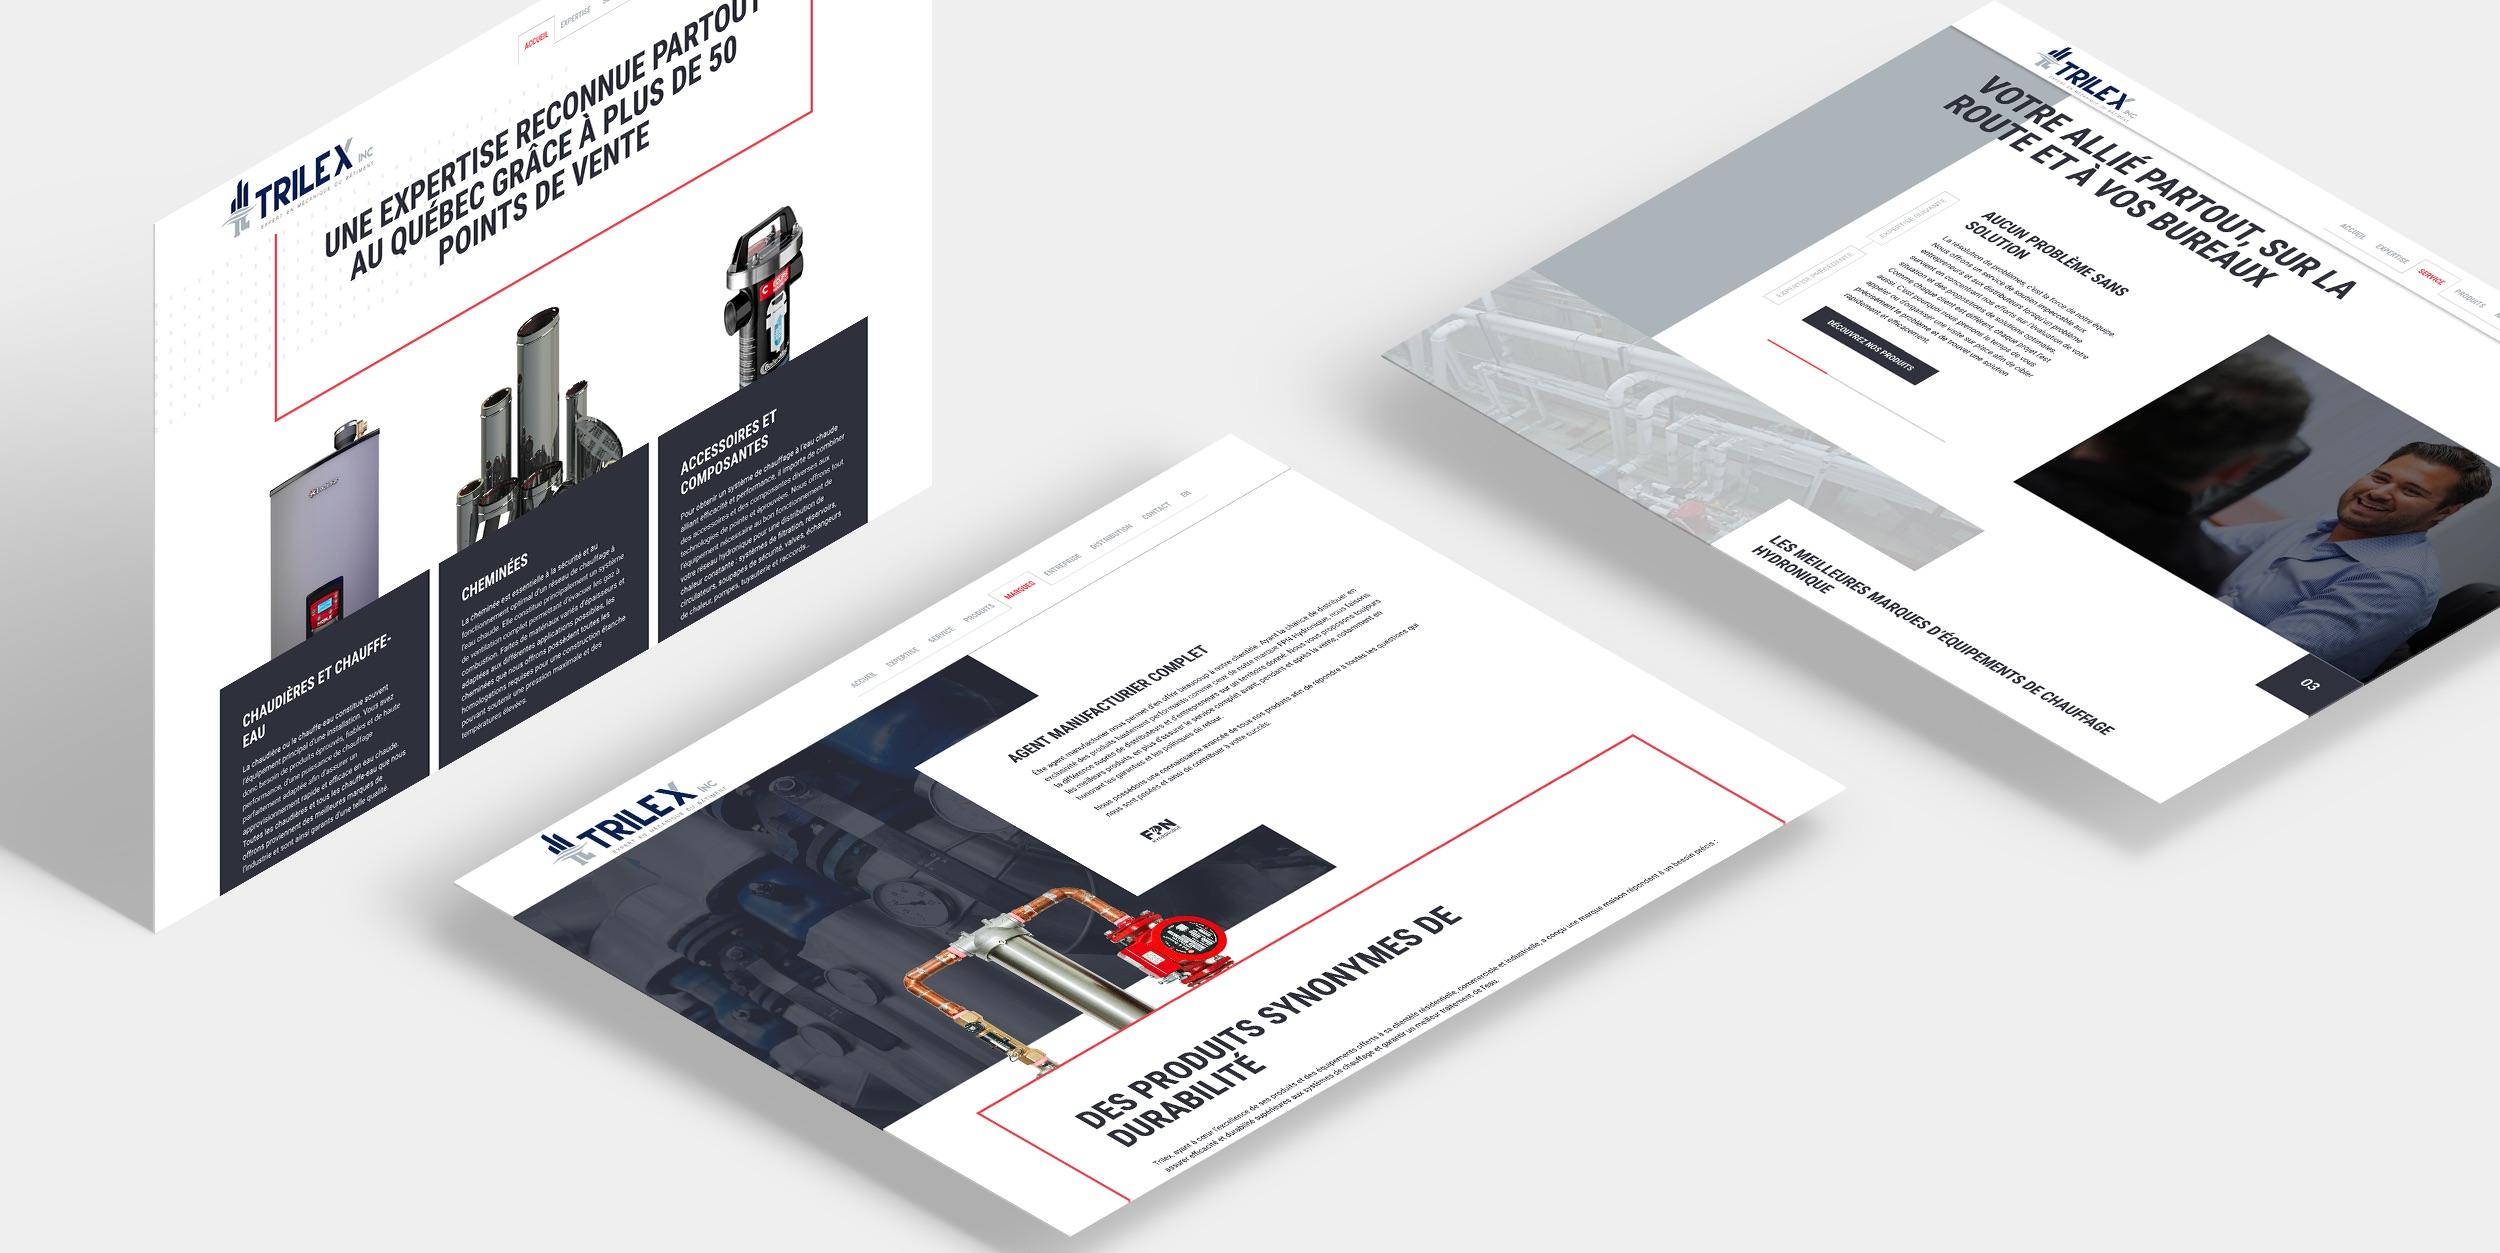 Image industrielle | Site Web Trilex | Design moderne